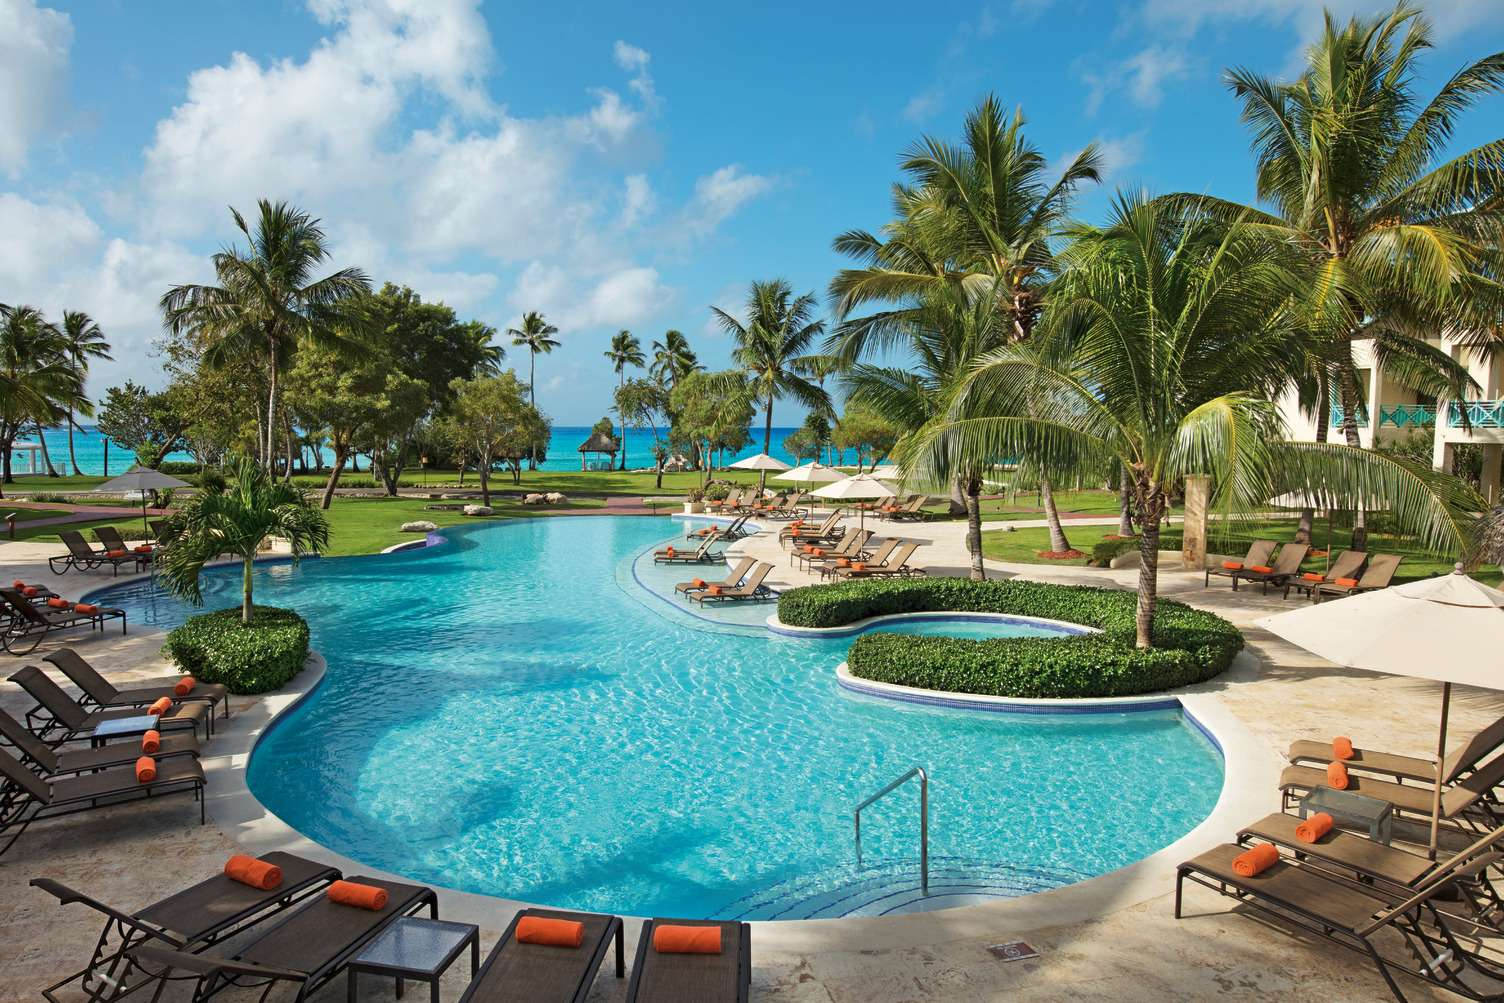 Image of Dreams La Romana Resort & Spa, Punta Cana, Dom Rep